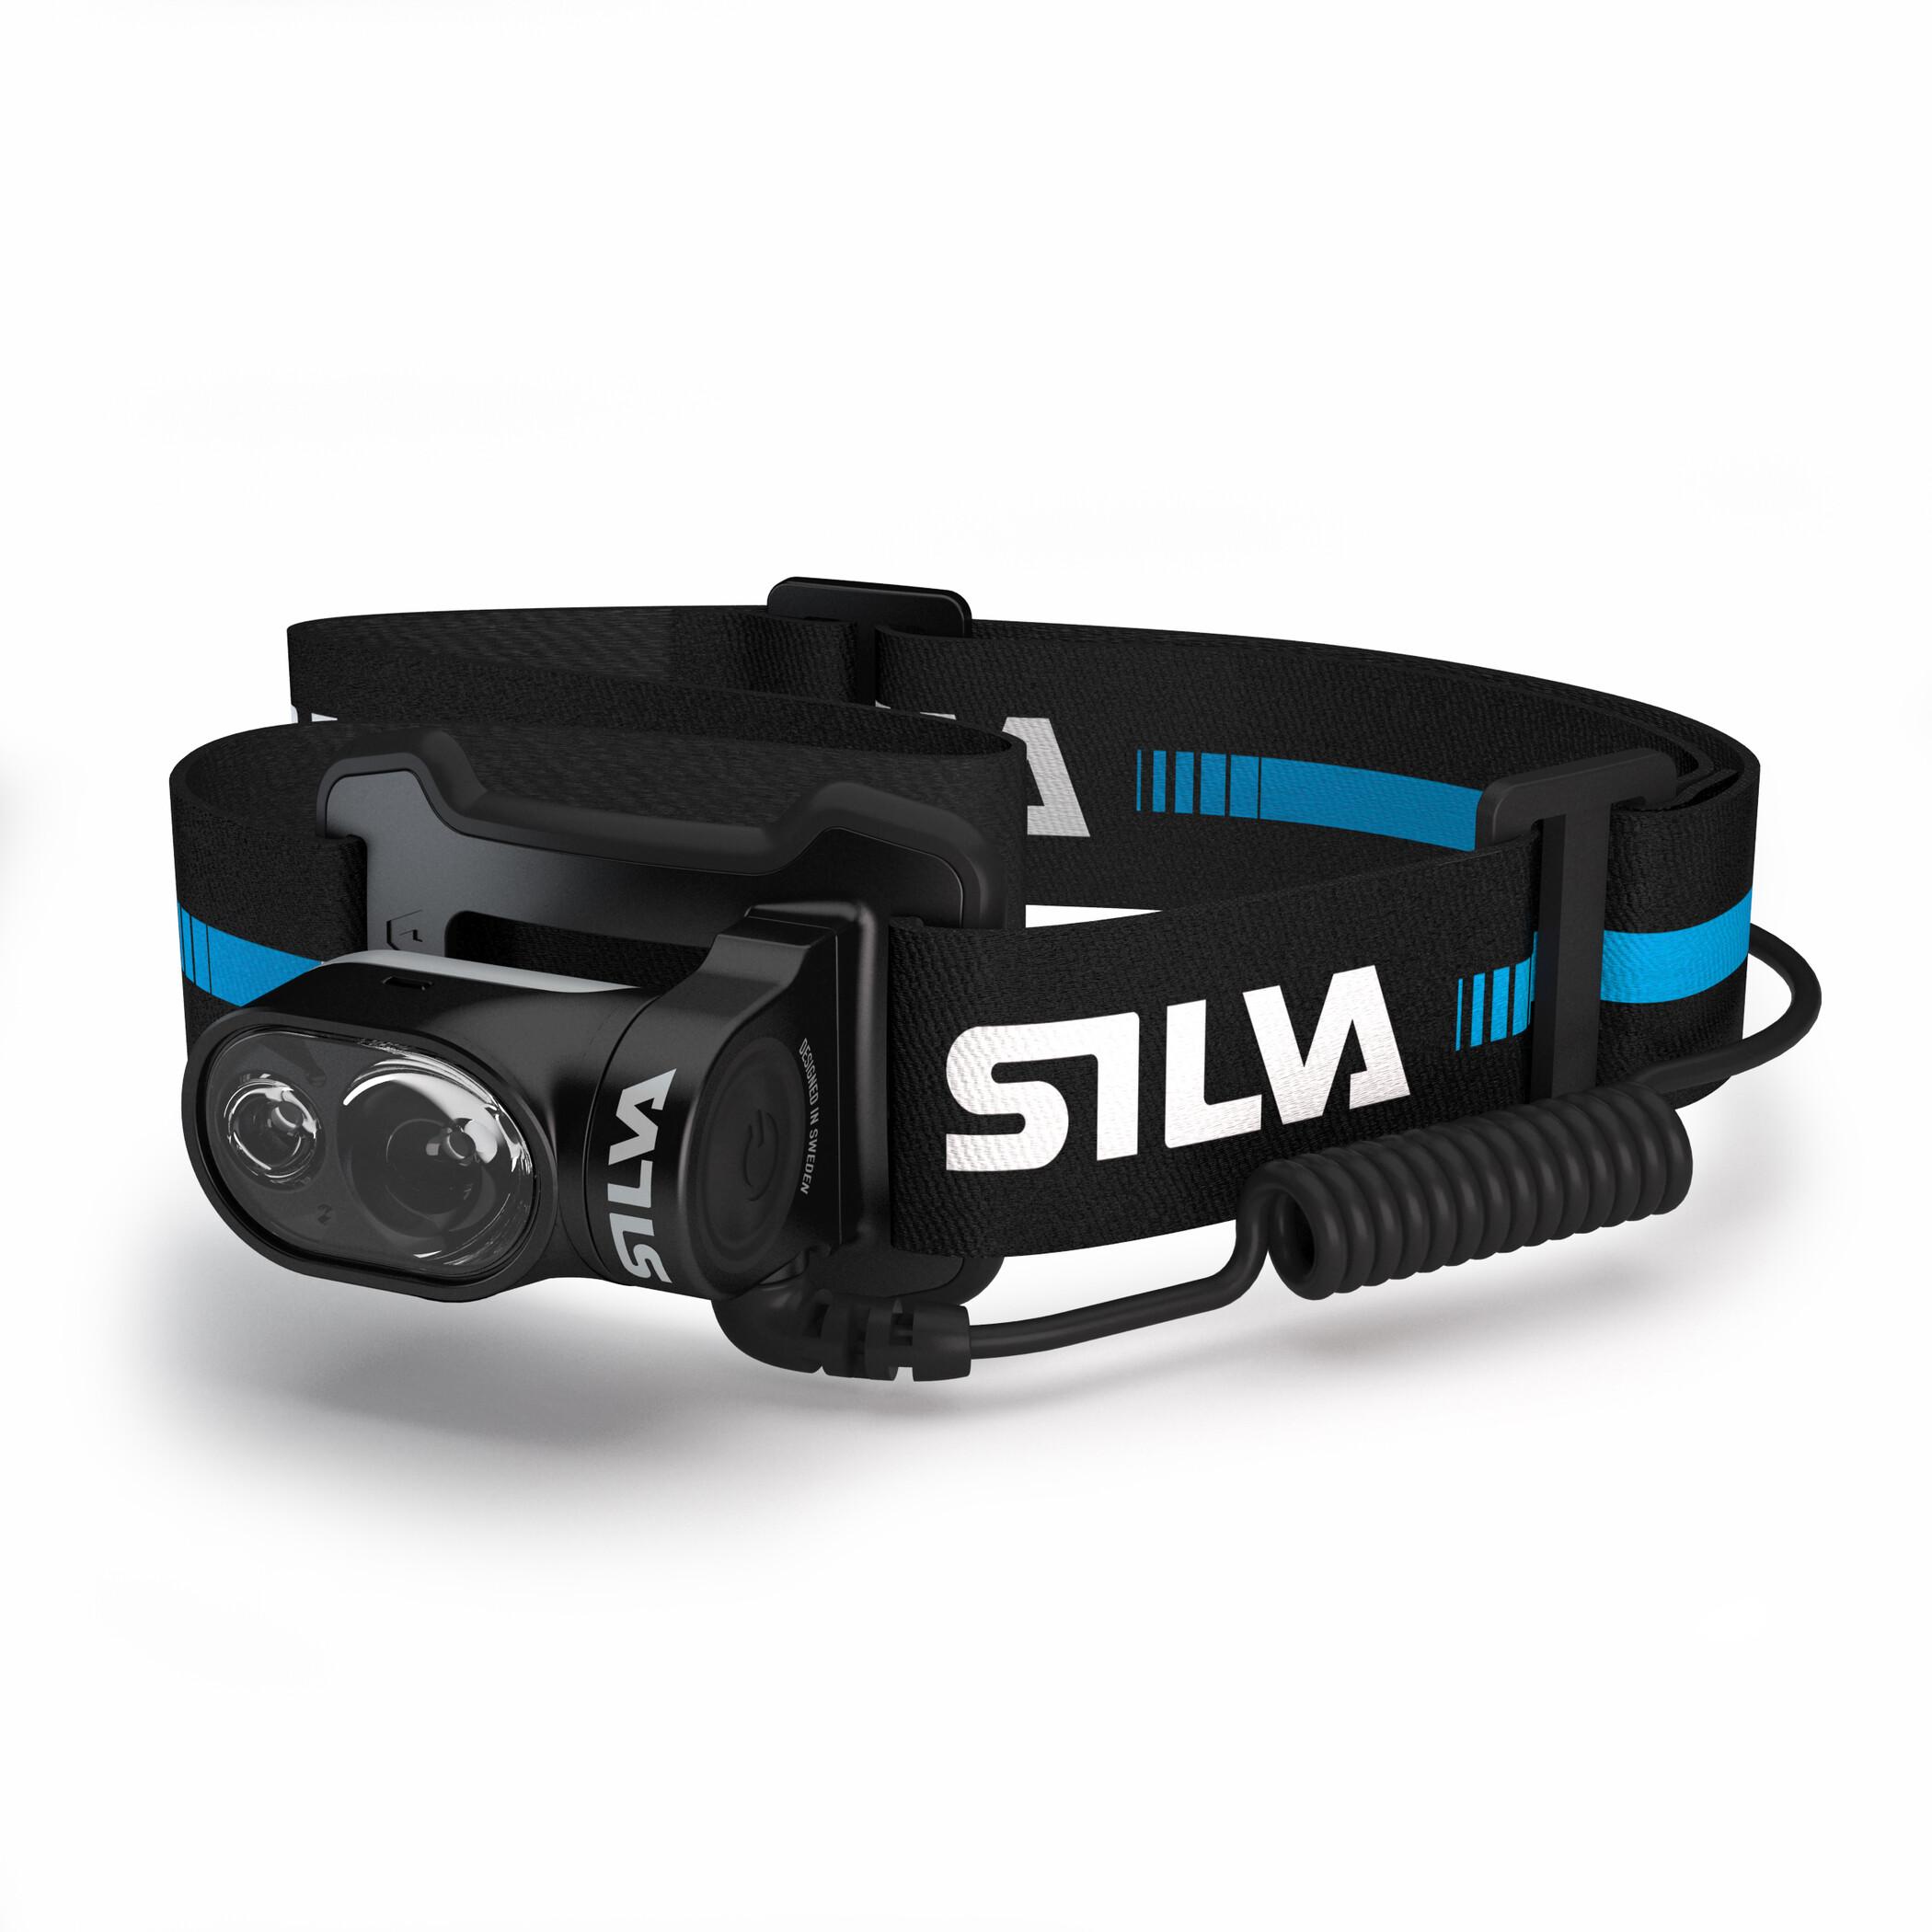 Silva Cross Trail 5X Pandelampe, universal (2019) | Headlamp